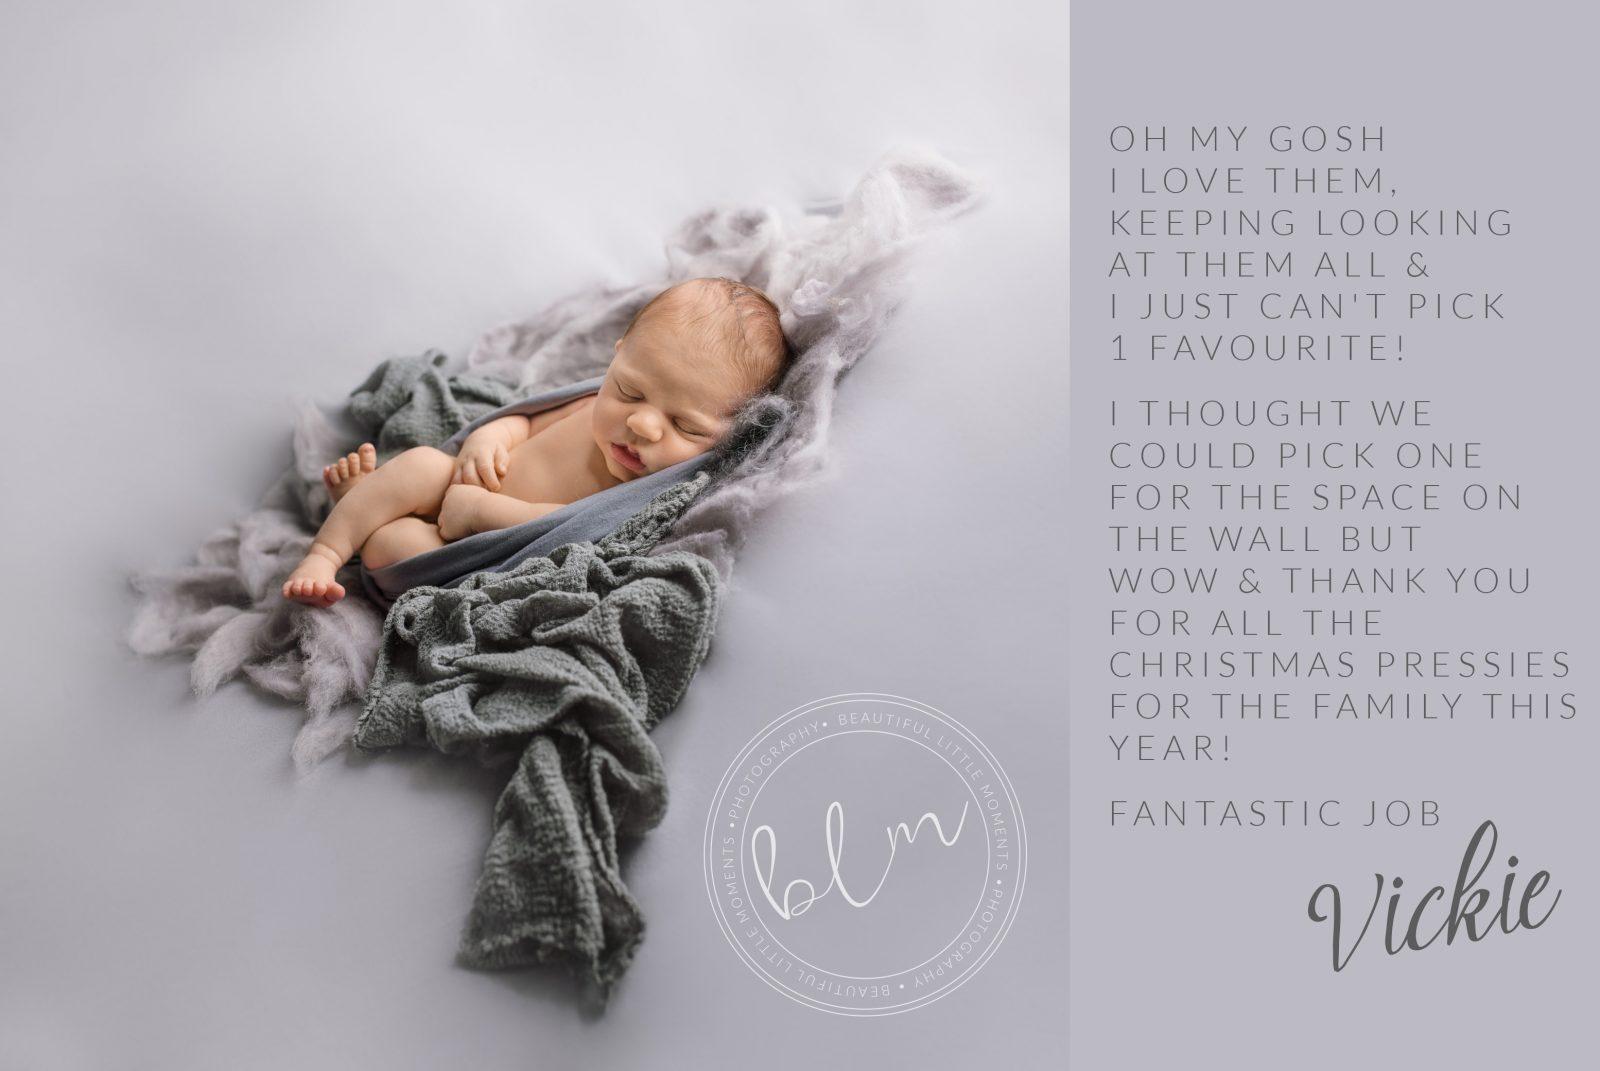 kind-words-testimonial-newborn